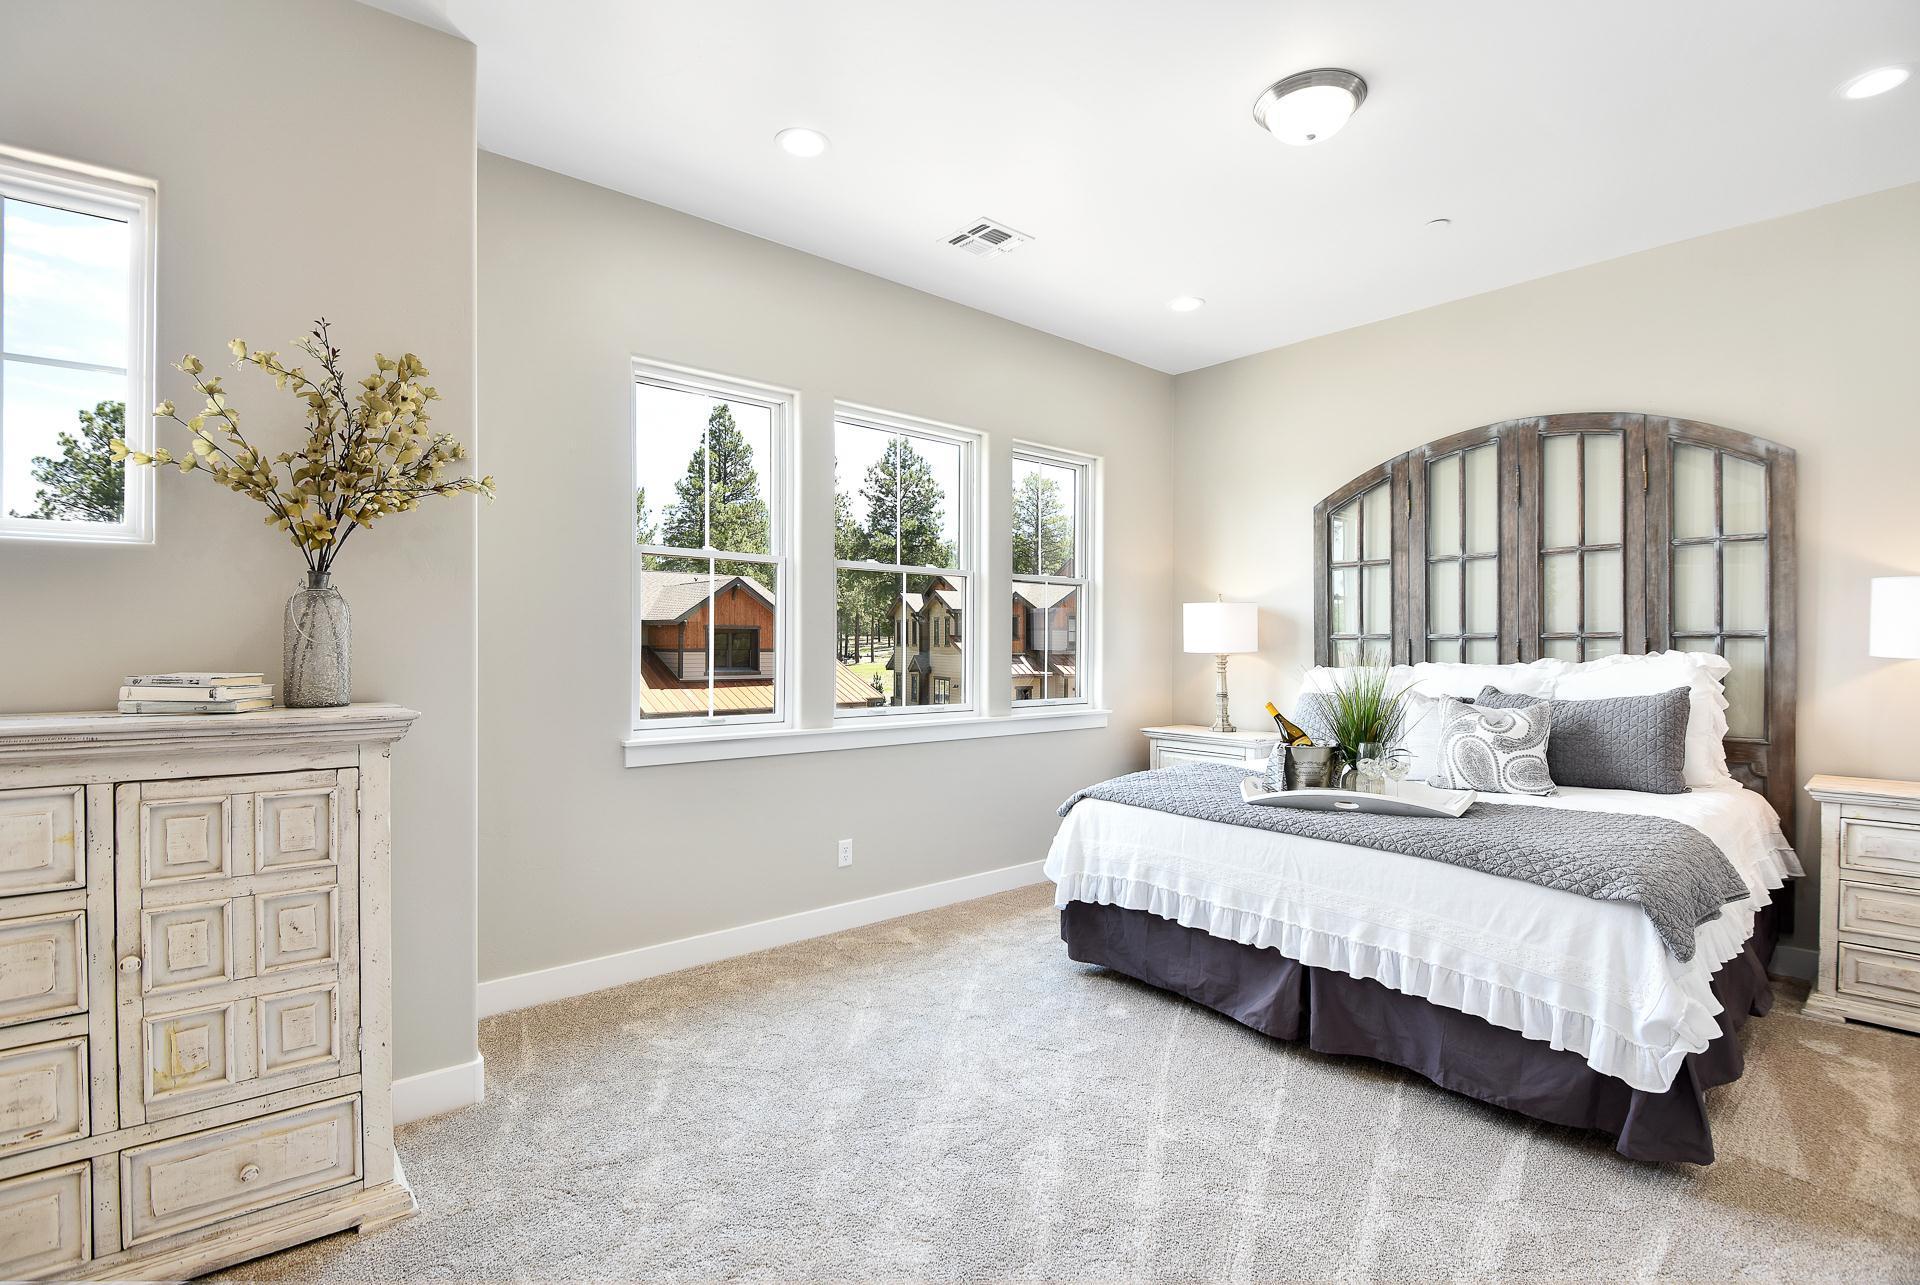 Bedroom featured in the Aspen Ridge Plan 6 By Capstone Homes in Flagstaff, AZ